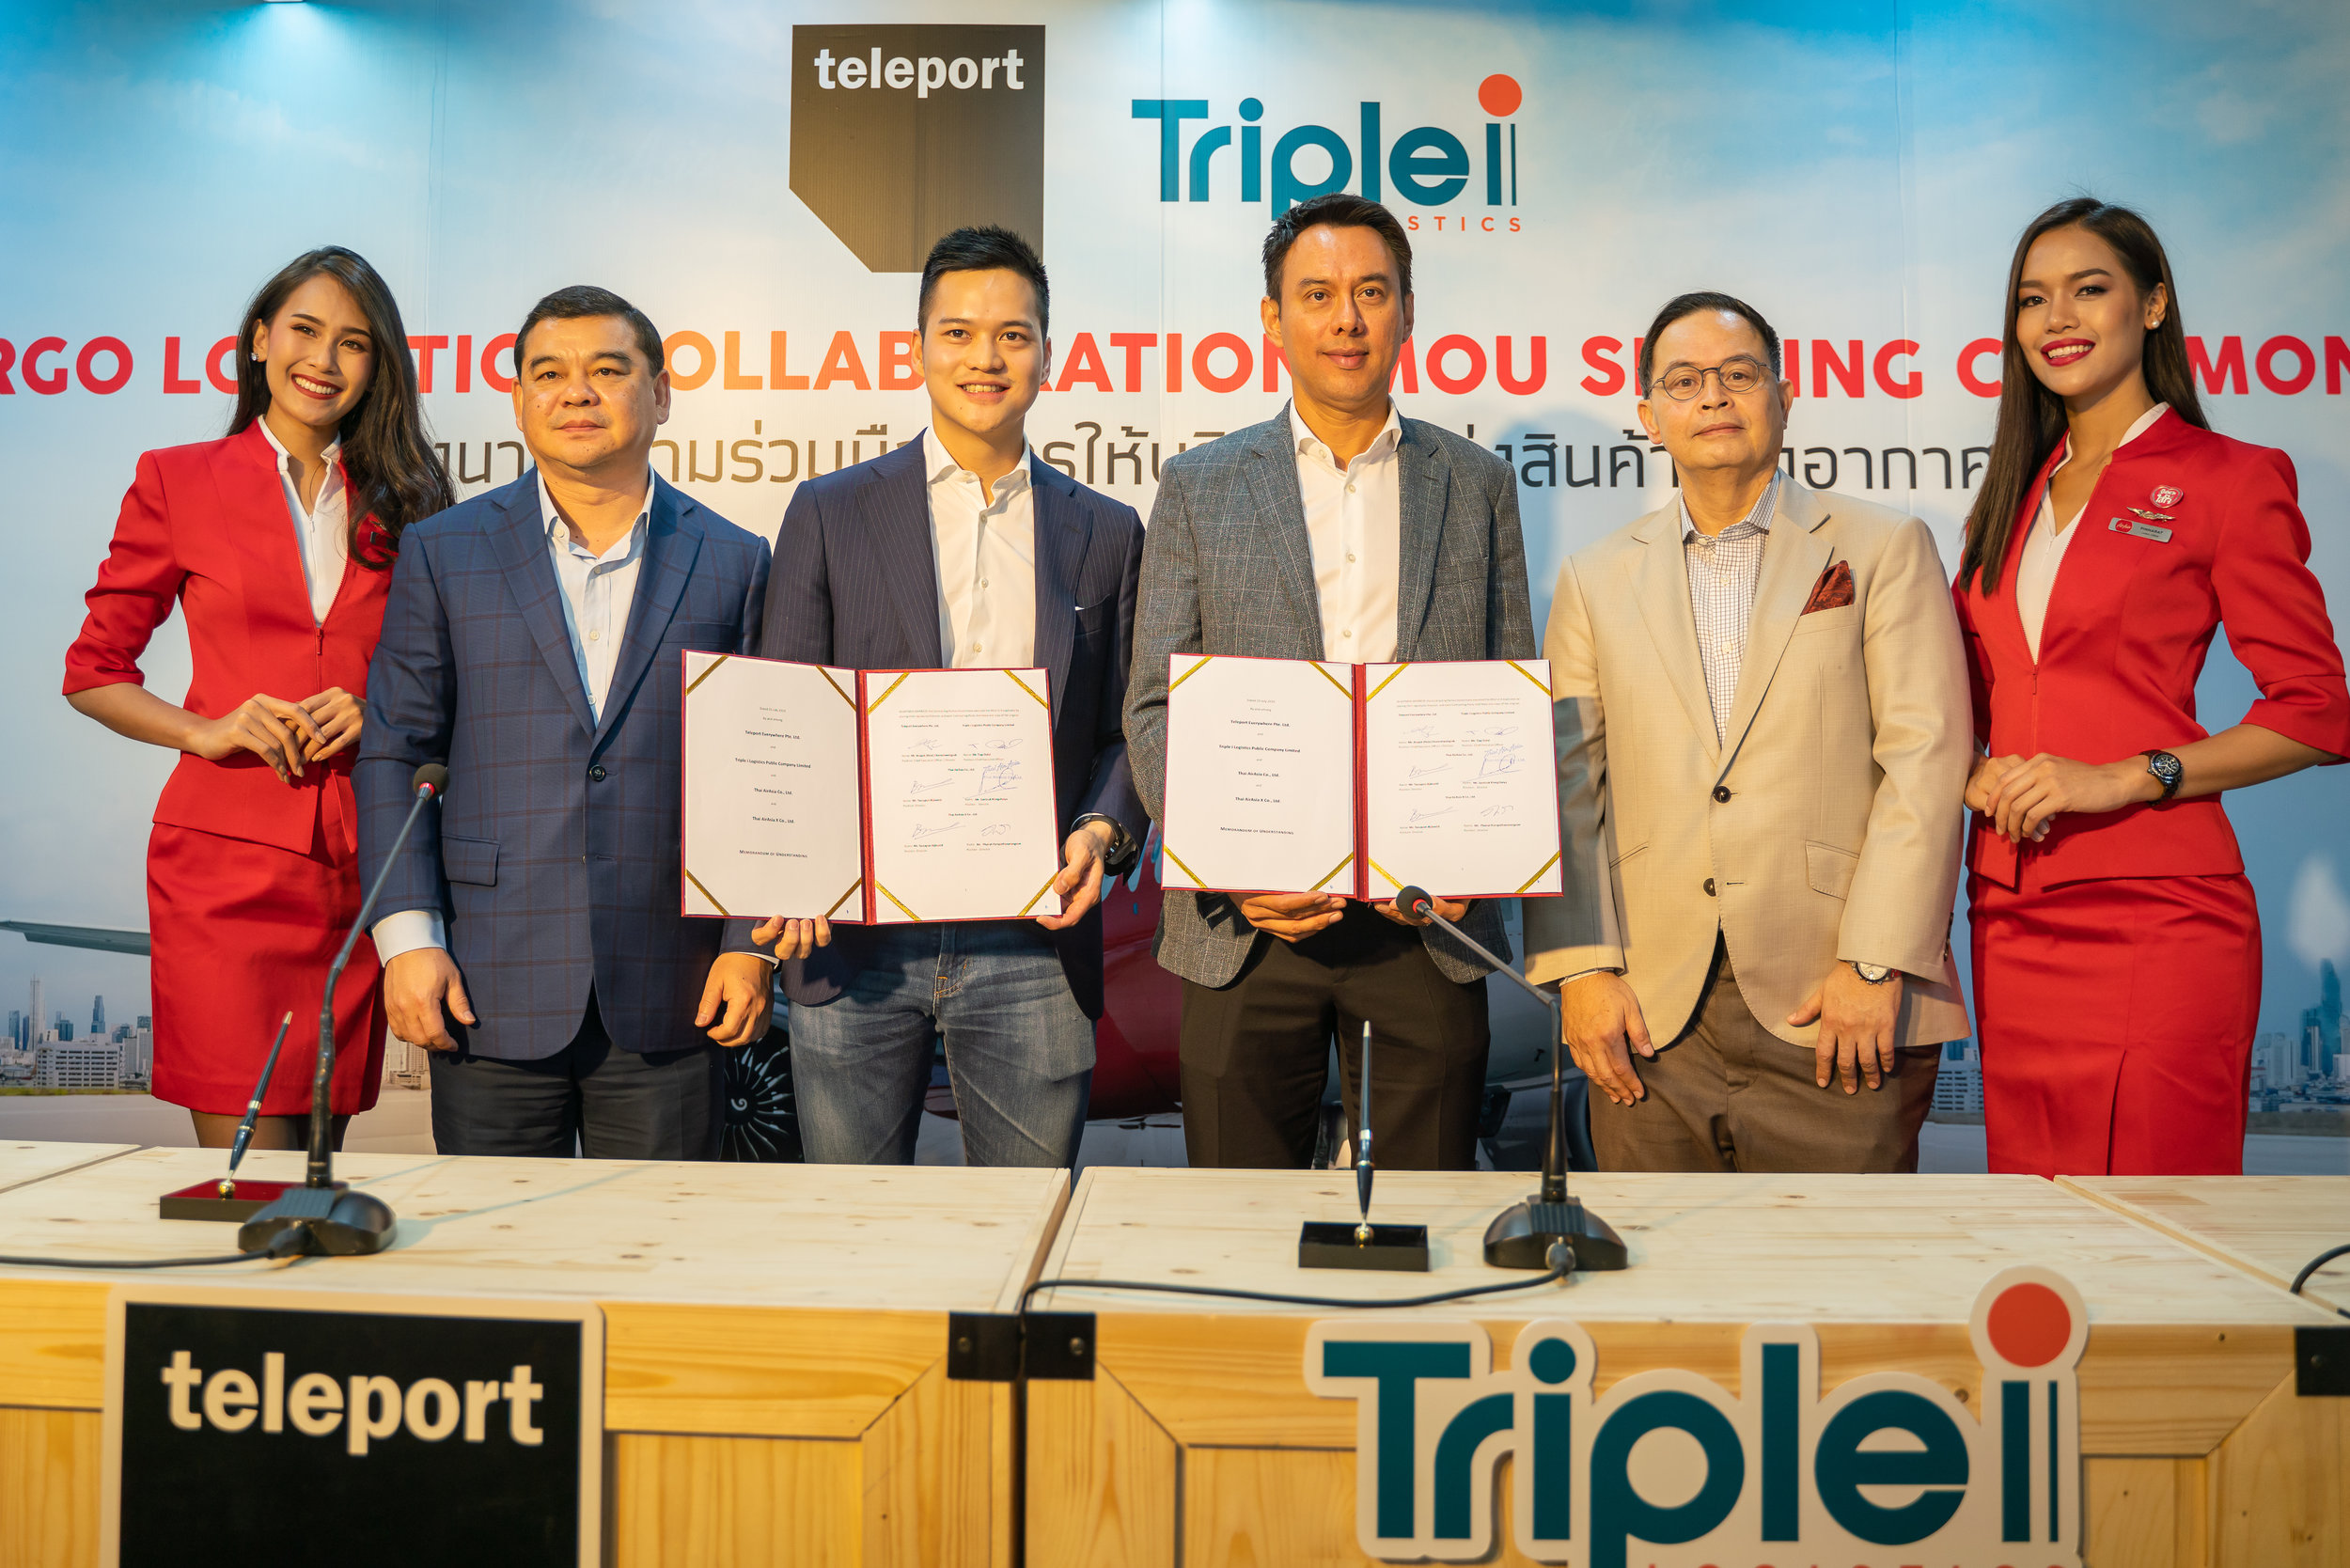 Photo Caption  (L-R): AirAsia Thailand CEO Santisk Klongchaiya; Teleport CEO Pete Chareonwongsak; Triple i Group CEO Mr. Tipp Dalal; AirAsia X Group CEO and AirAsia X Thailand CEO Nadda Buranasiri flanked by AirAsia Cabin Crew.